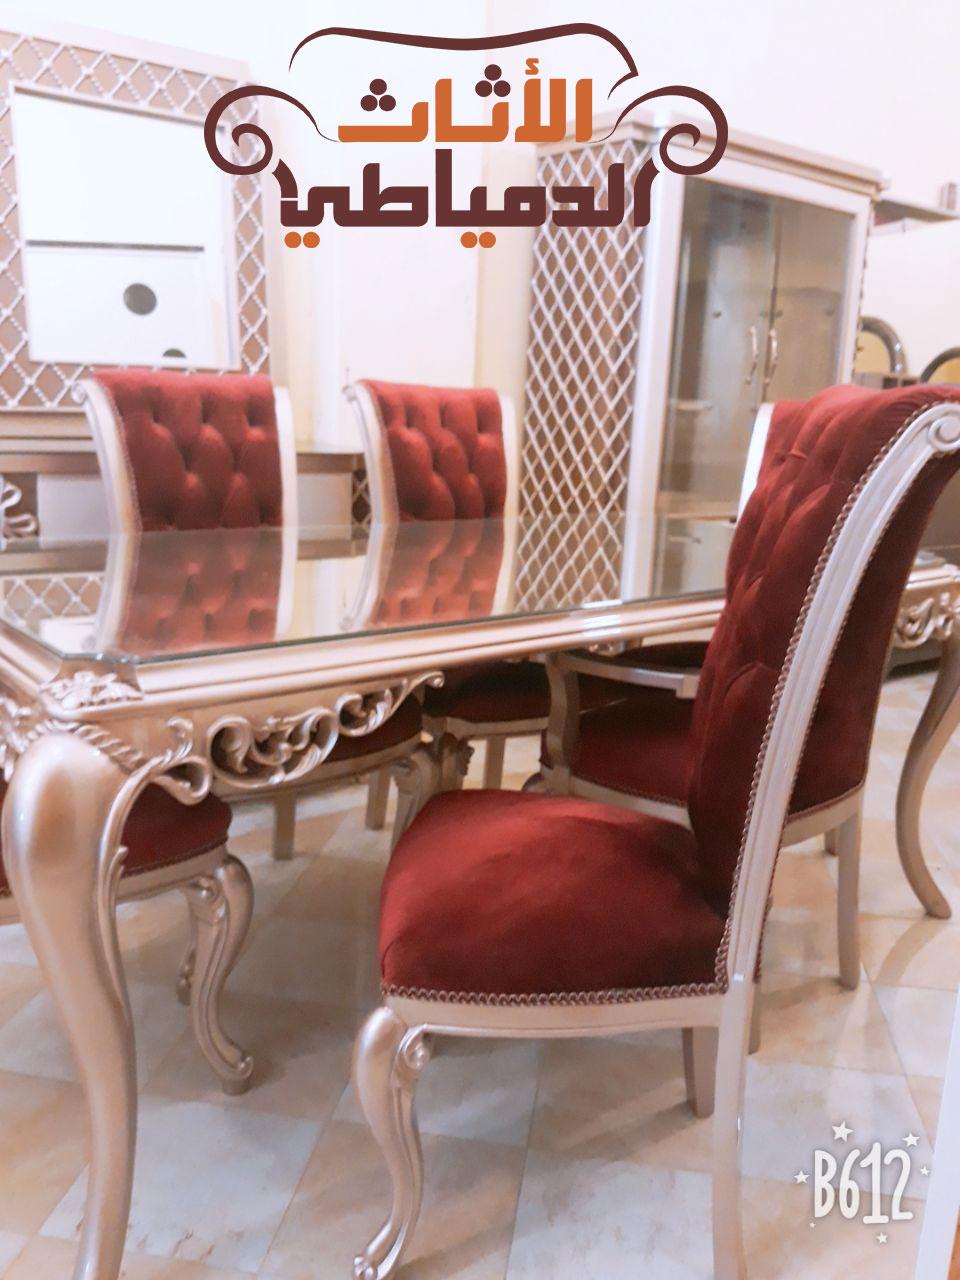 اسعار السفرة  from i1.wp.com